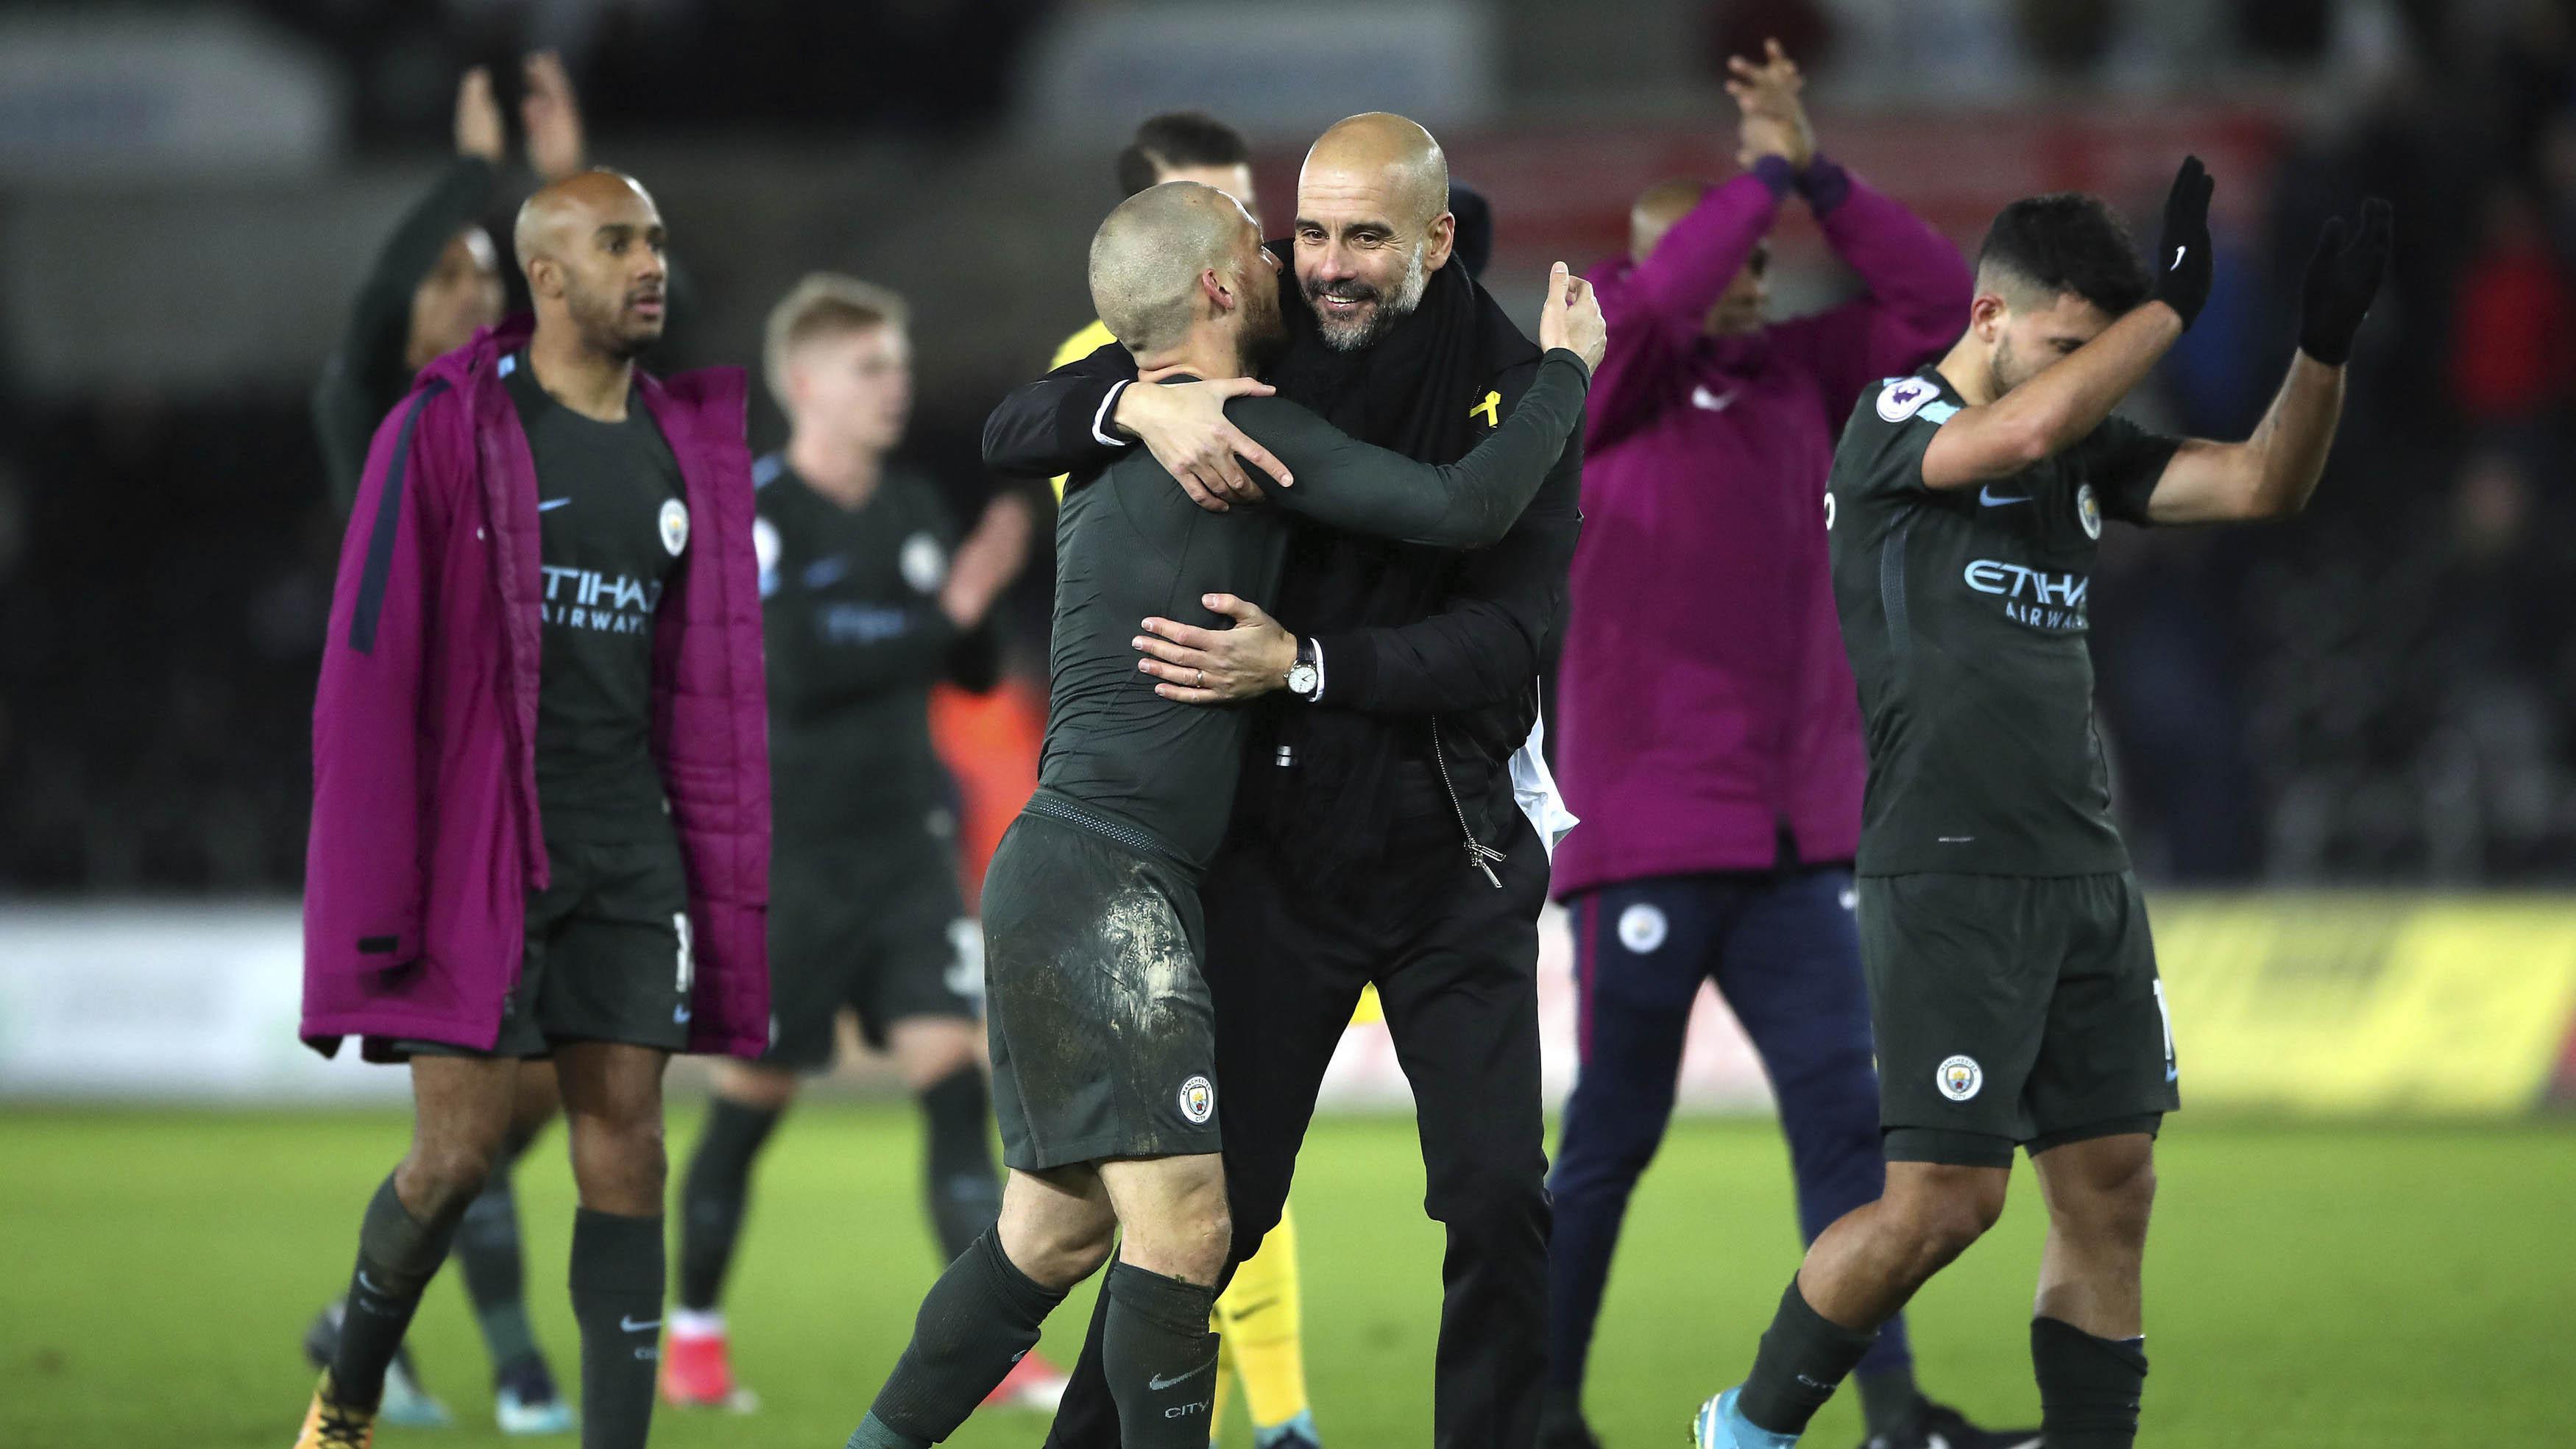 Pelatih Manchester City, Pep Guardiola, merayakan kemenangan atas Swansea City pada laga Premier League di Stadion Liberty, Rabu (13/12/2017). Manchester City menang 4-0 atas Swansea City. (AP/Nick Potts)